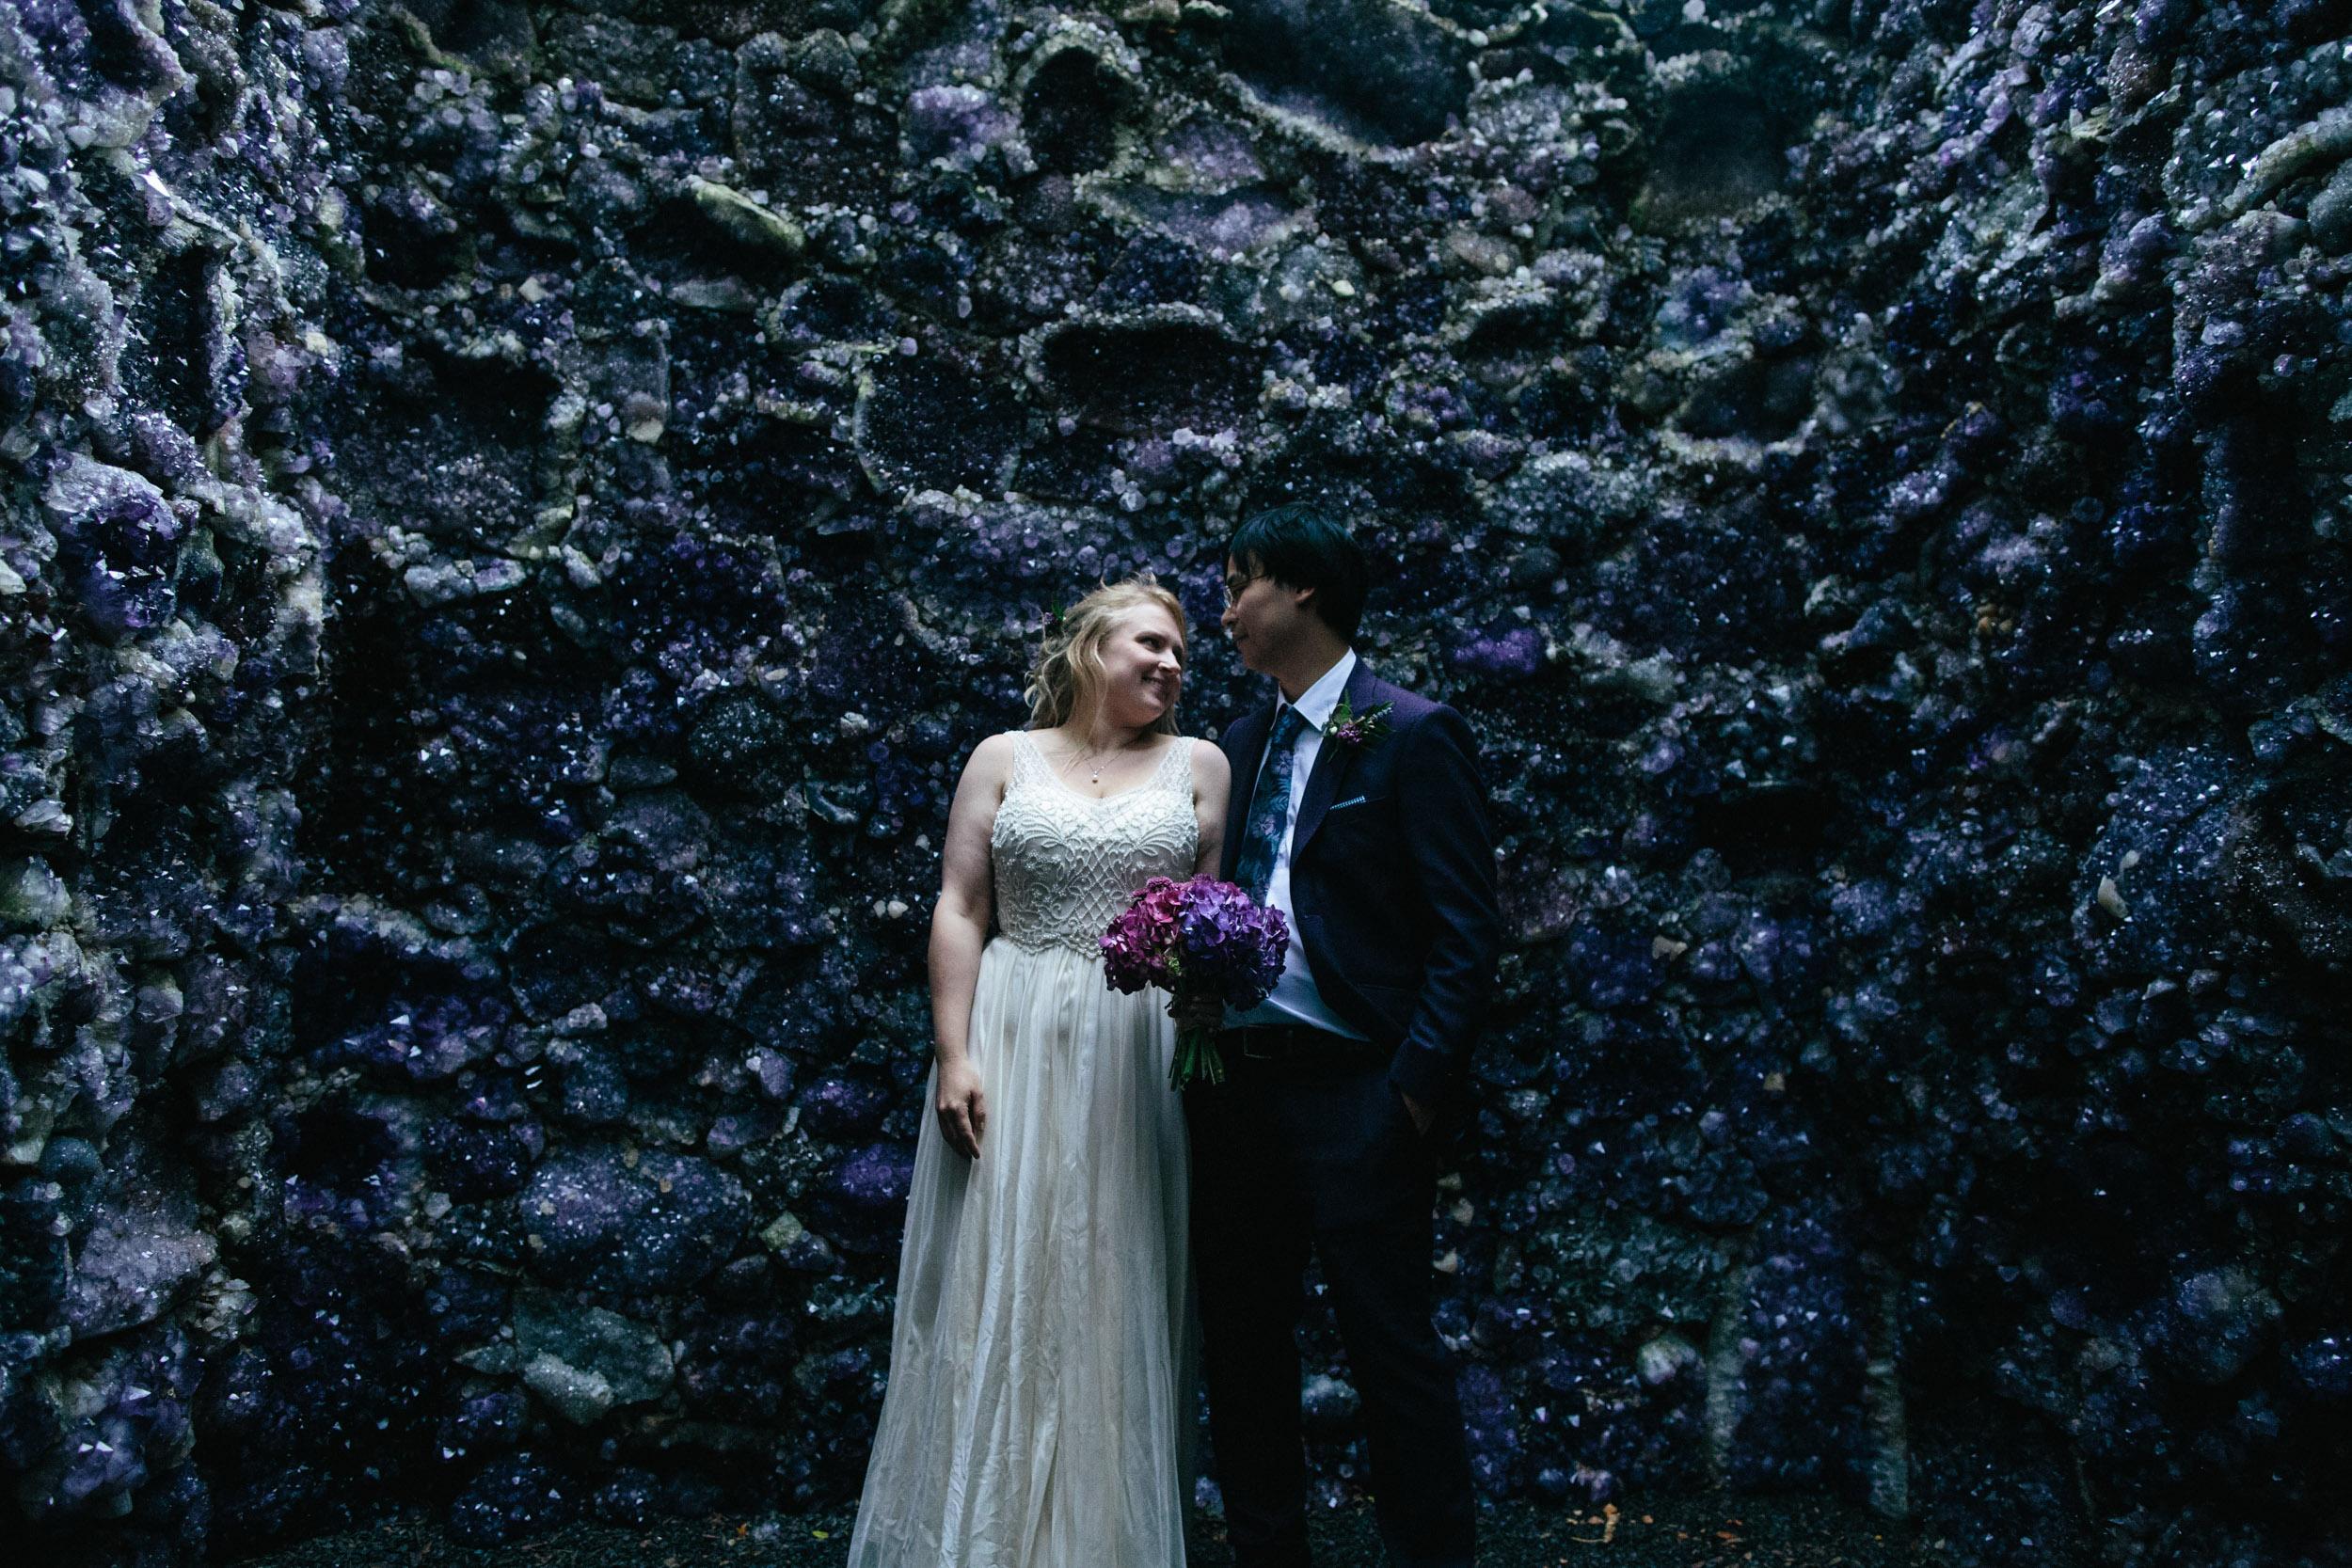 Quirky Wedding Photographer Edinburgh Jupiter Artland -71.jpg